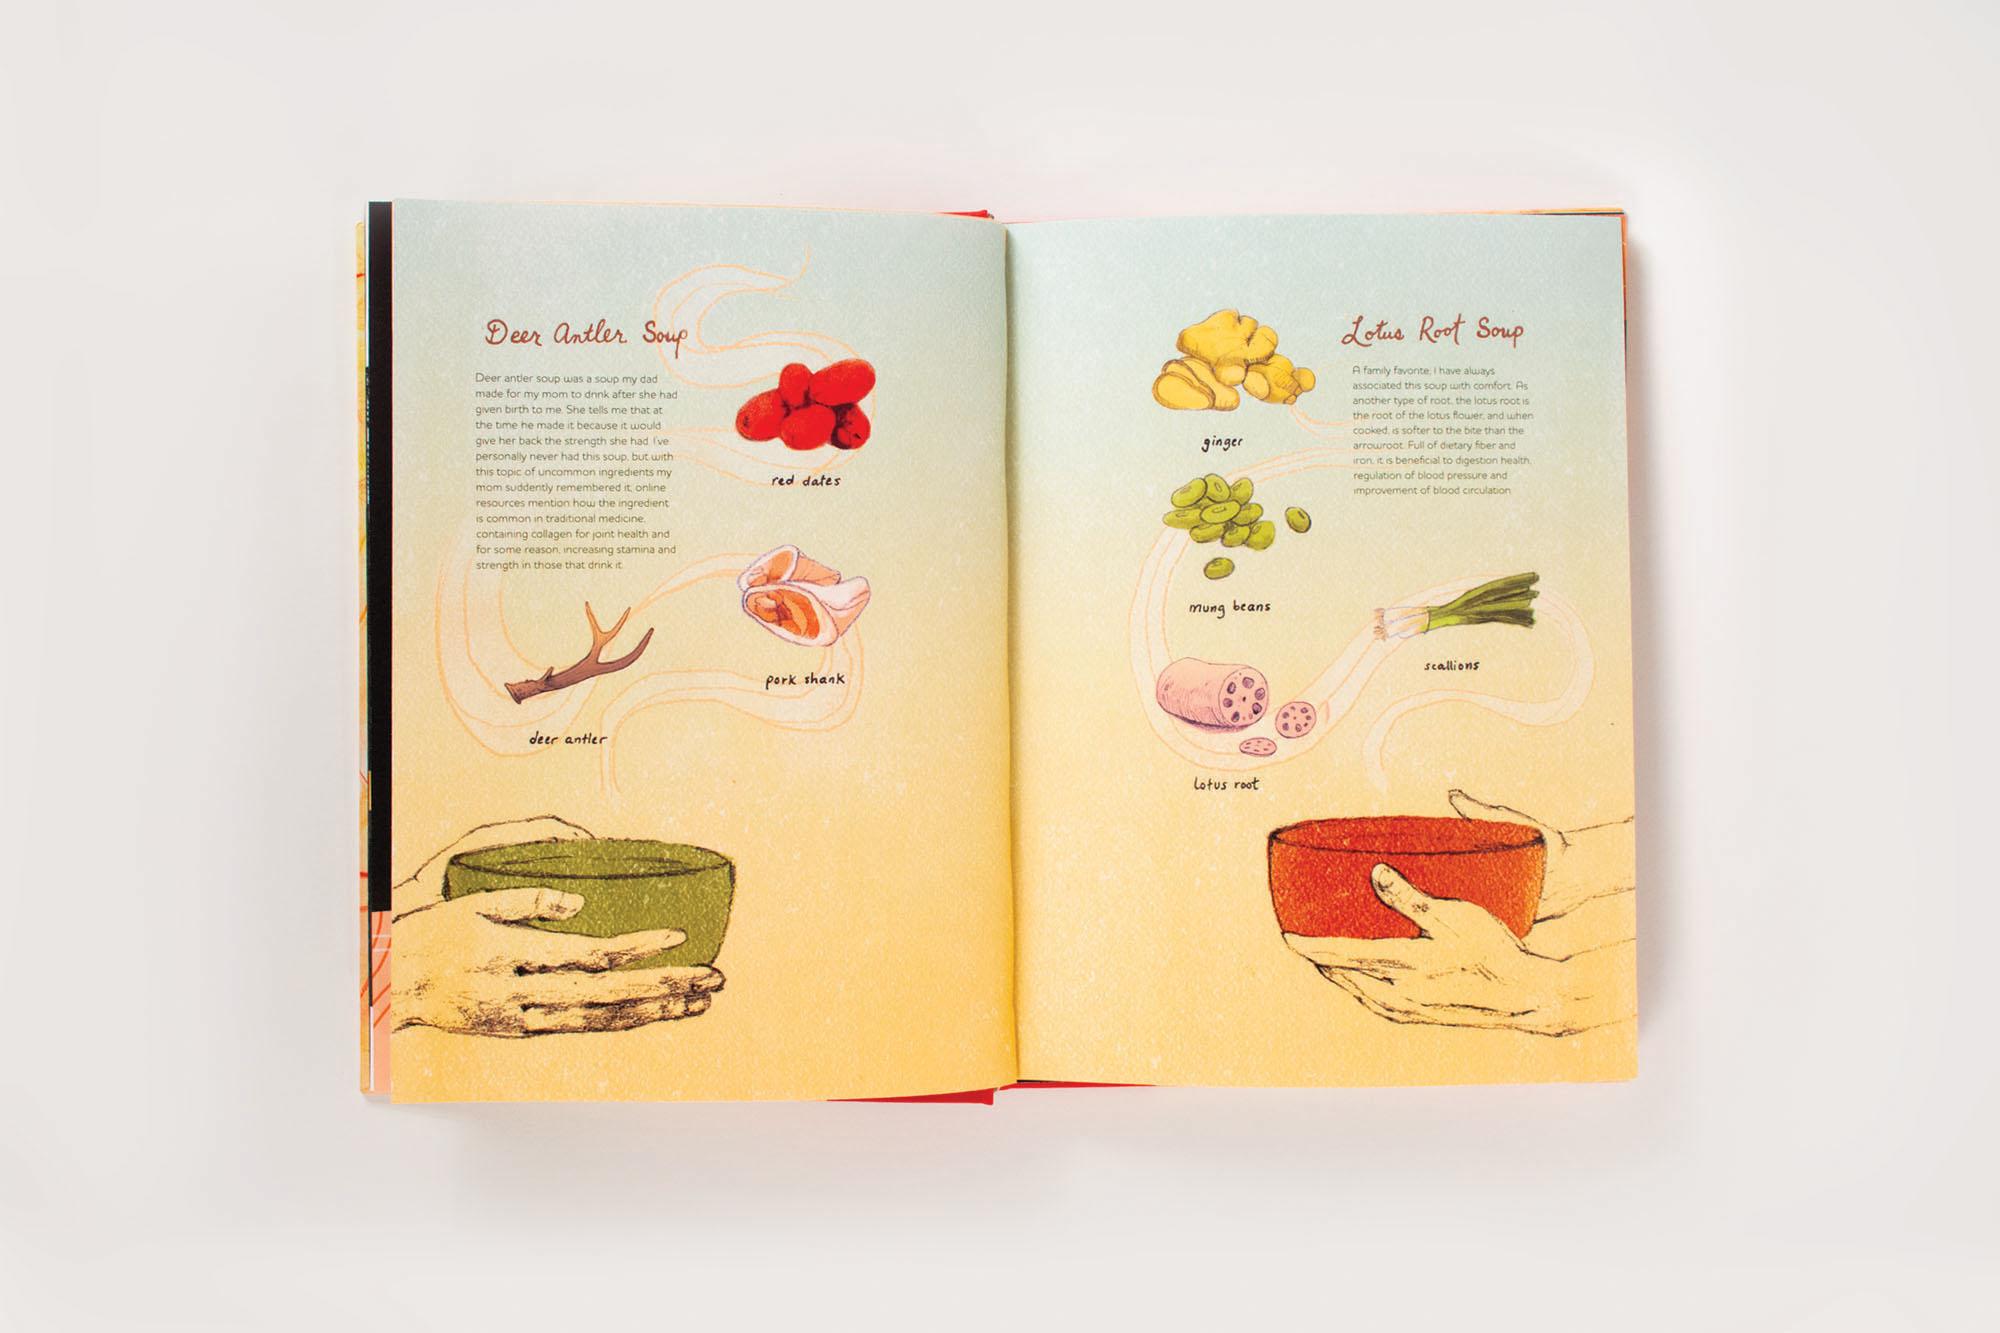 TangJessica-Bookbinding-4.jpg